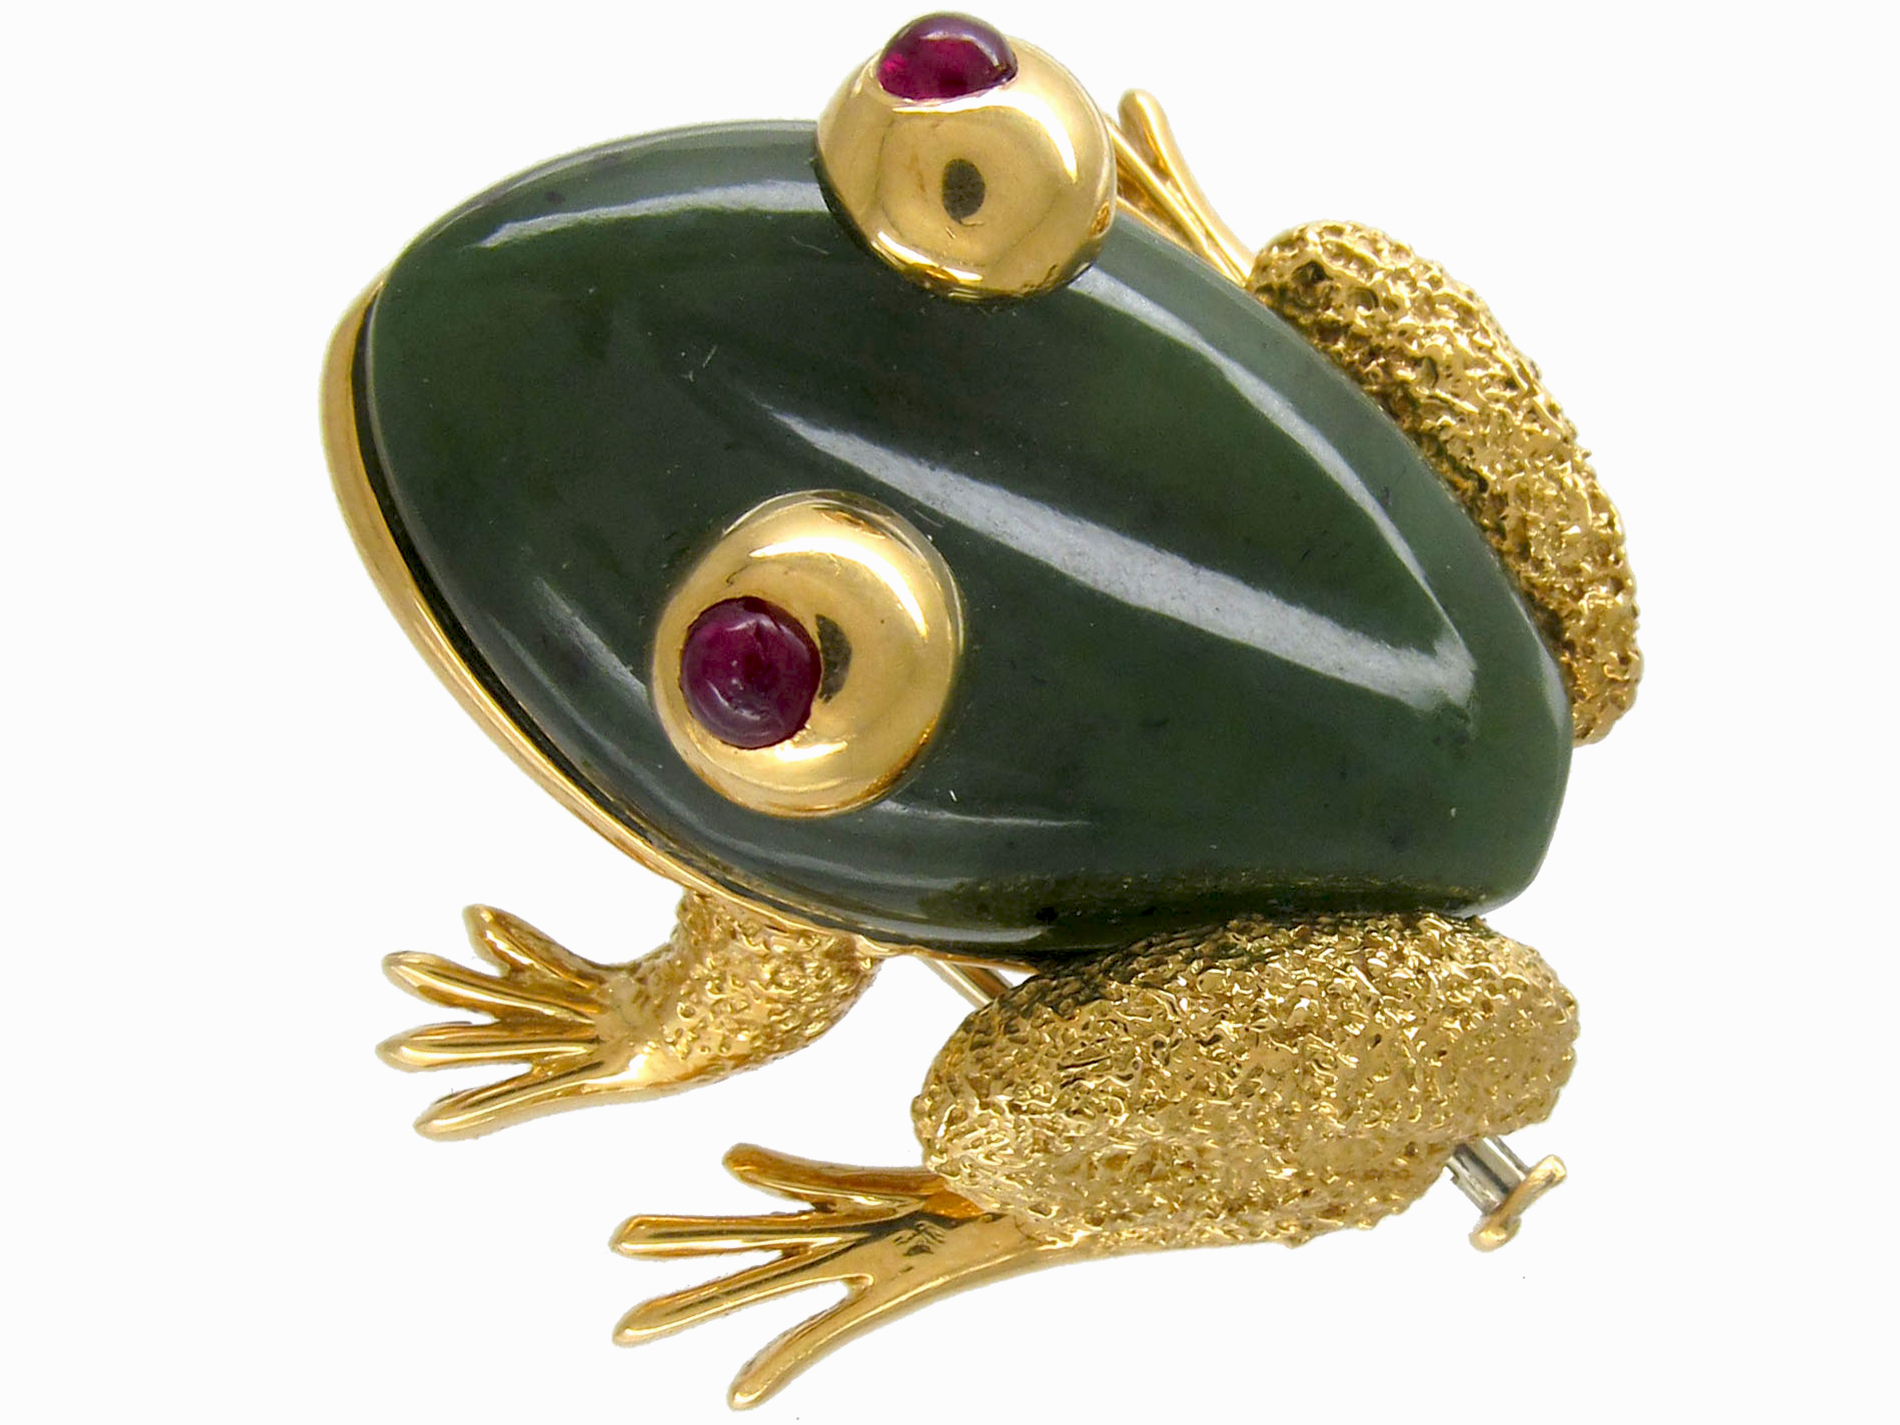 Nephrite Jade & Ruby Frog Brooch